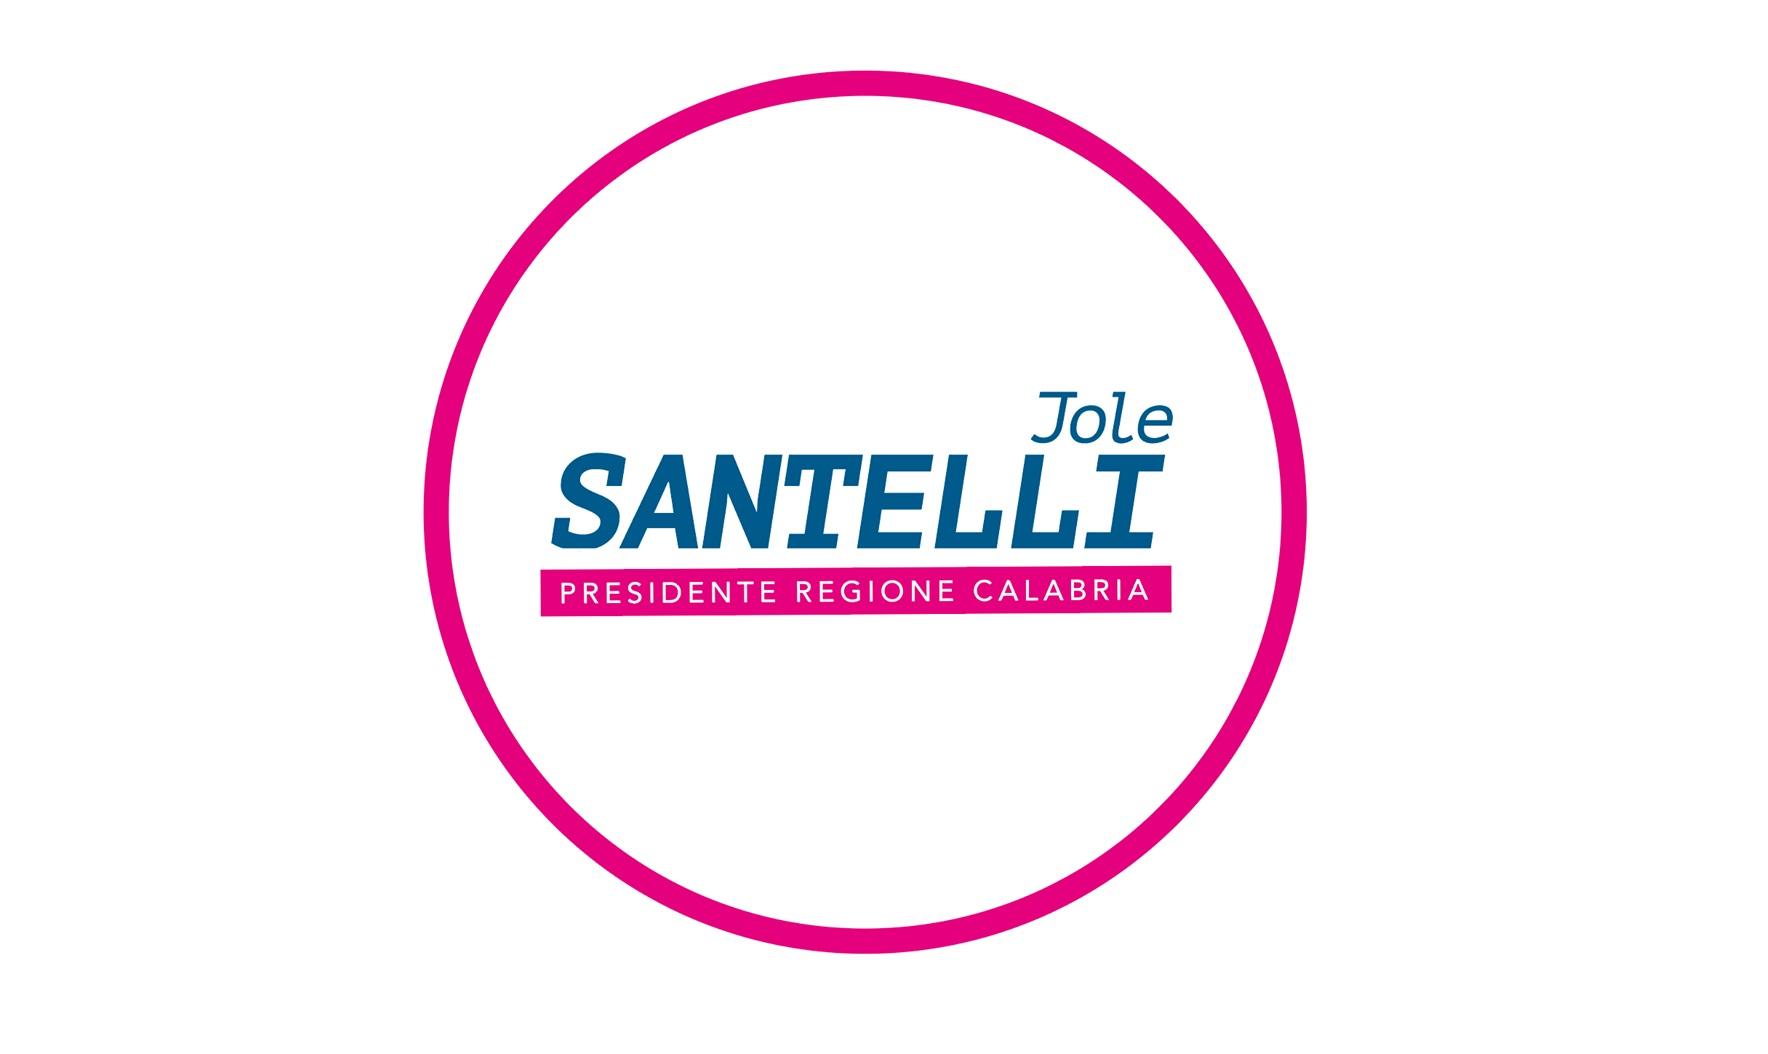 Jole Santelli è morta